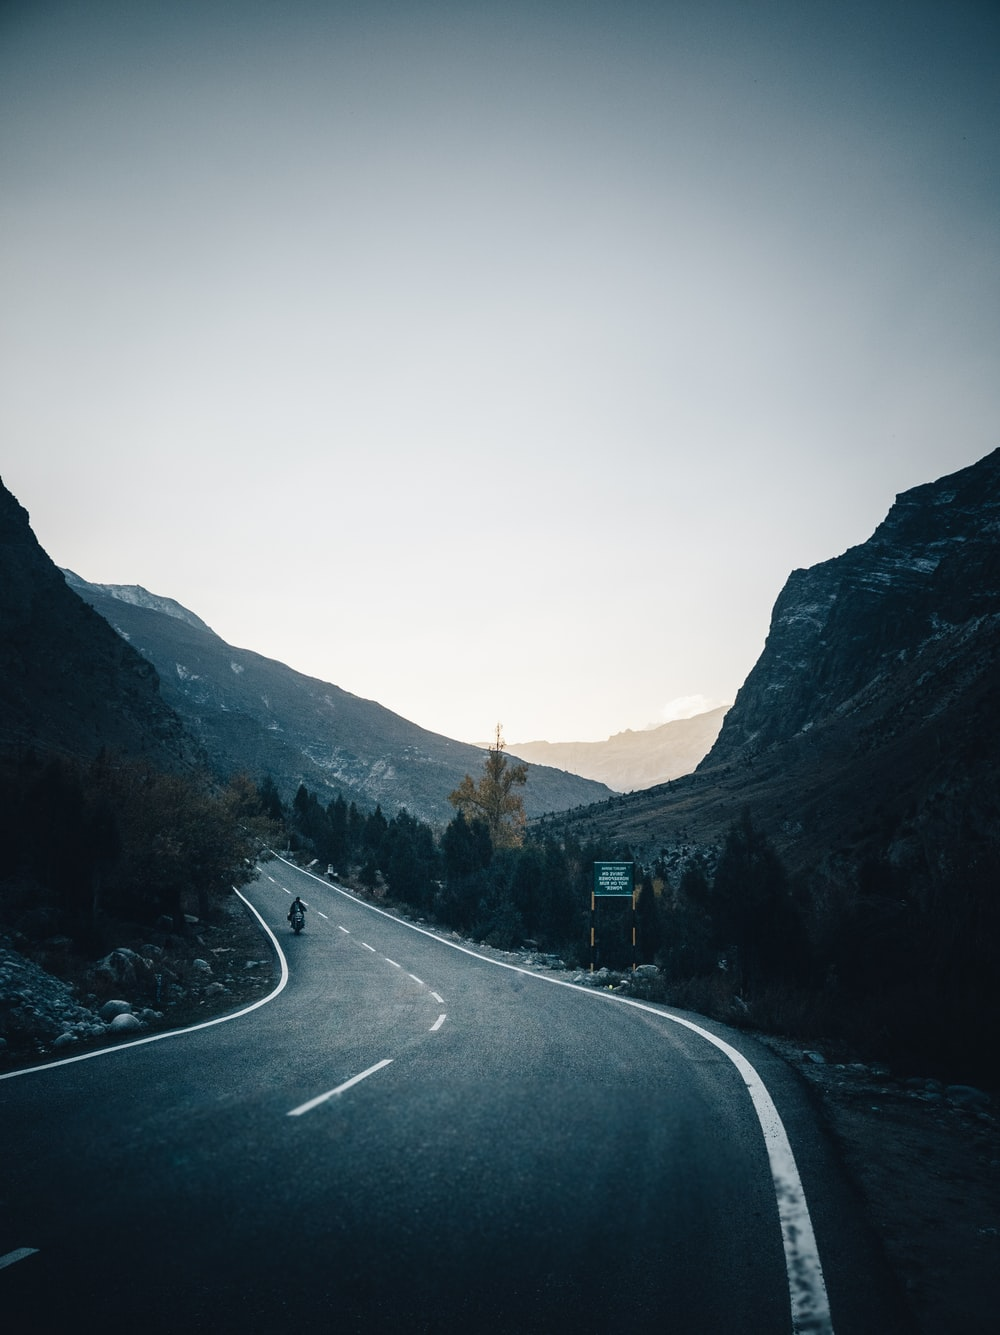 gray asphalt road between mountains during daytime